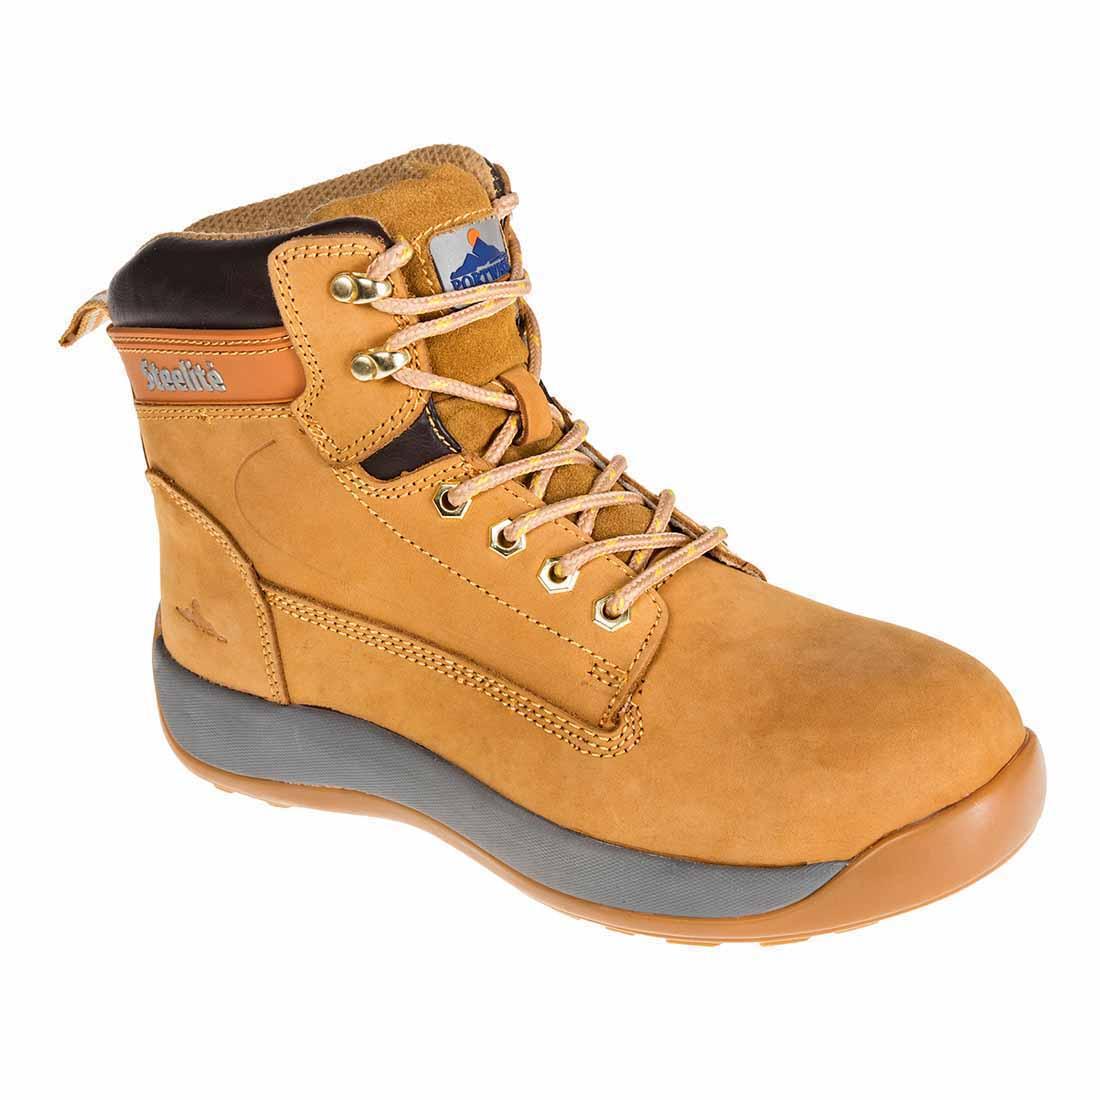 SUw - Steelite Safety Constructo Nubuck Workwear Ankle Safety Steelite Boot S3 HRO 369ee6